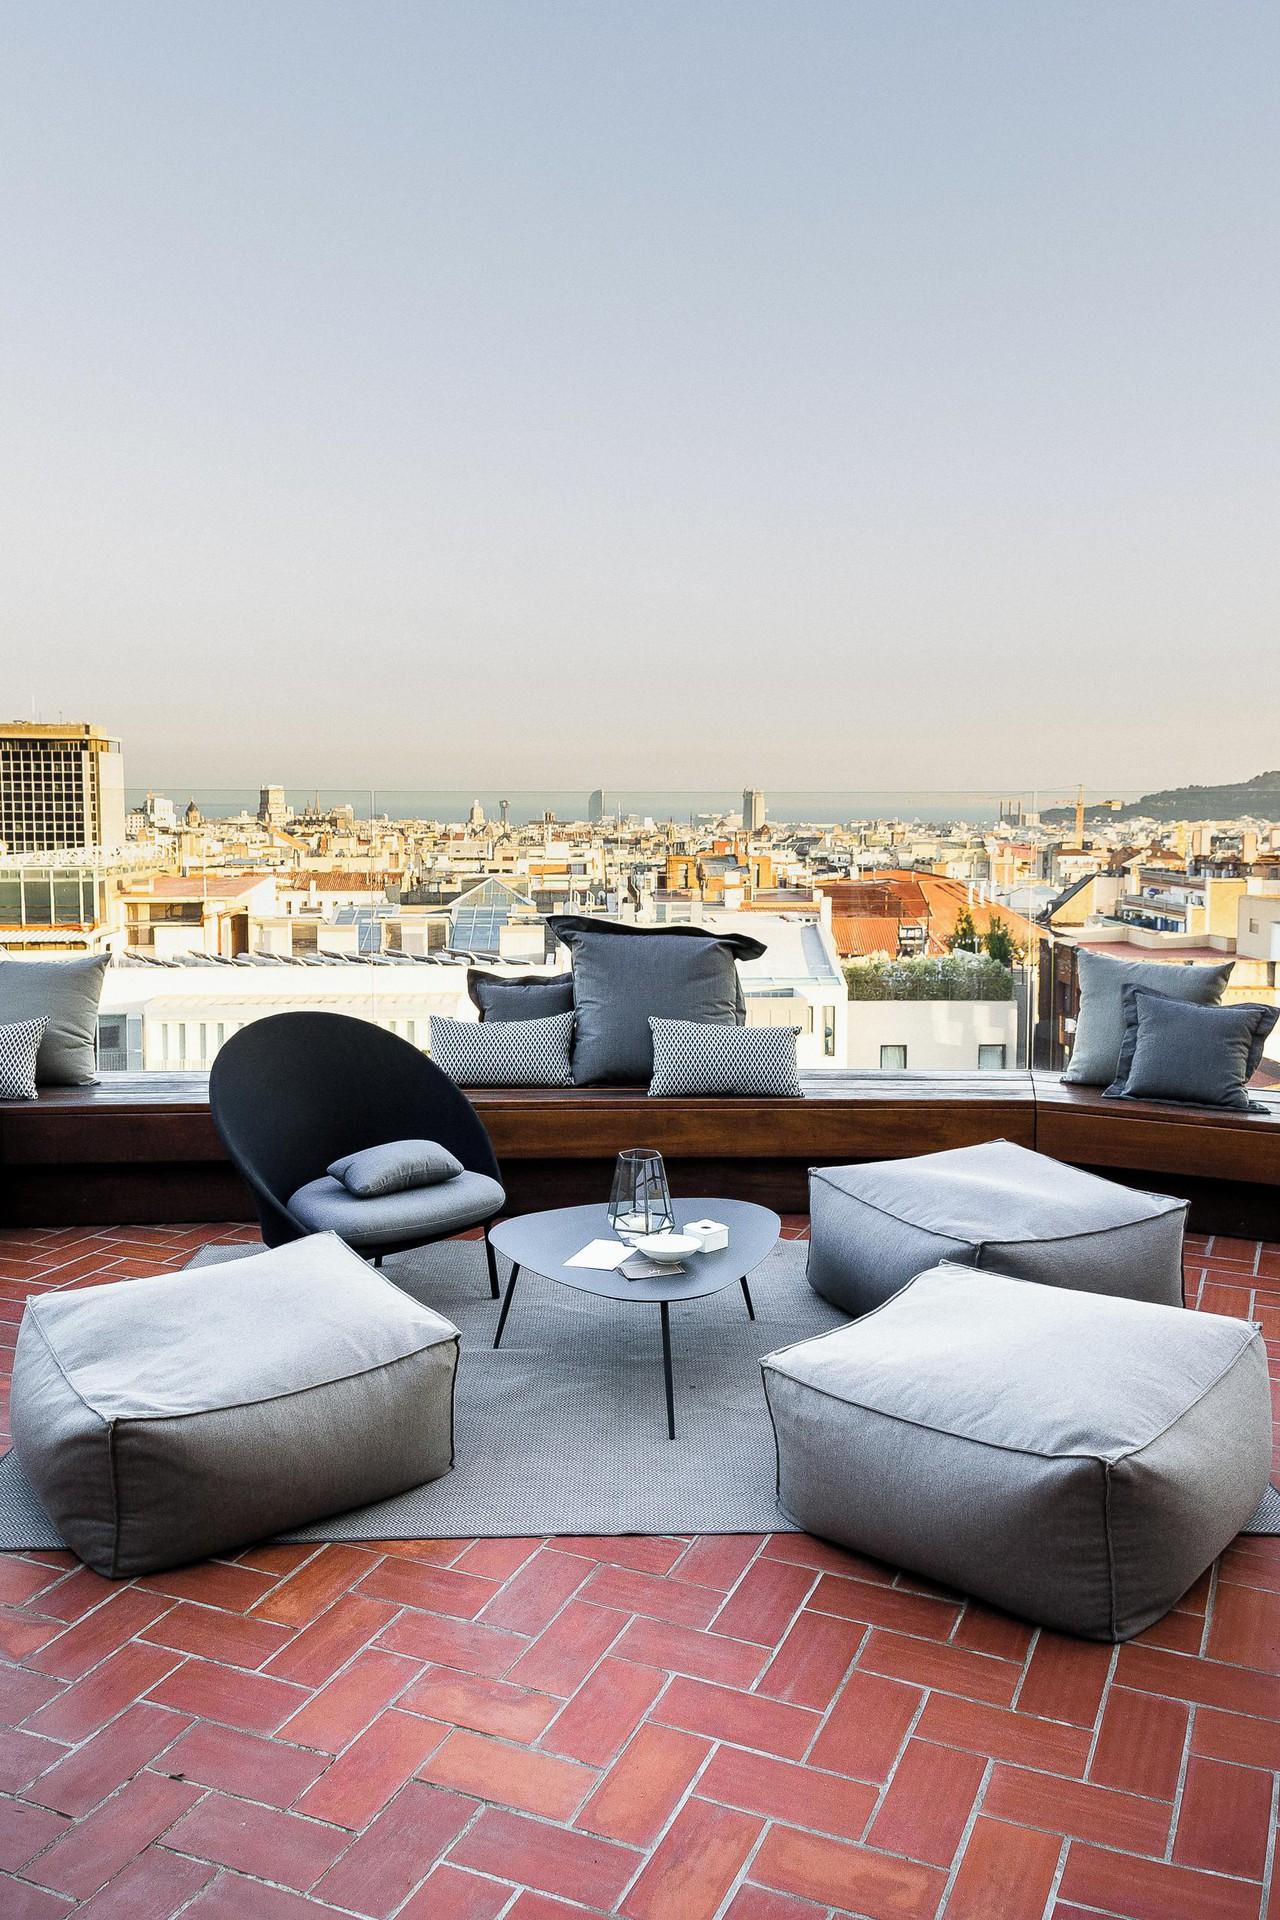 Barcelona workshop spaces Rooftop Rooftop | Event venue in Diagonal, Barcelona image 2